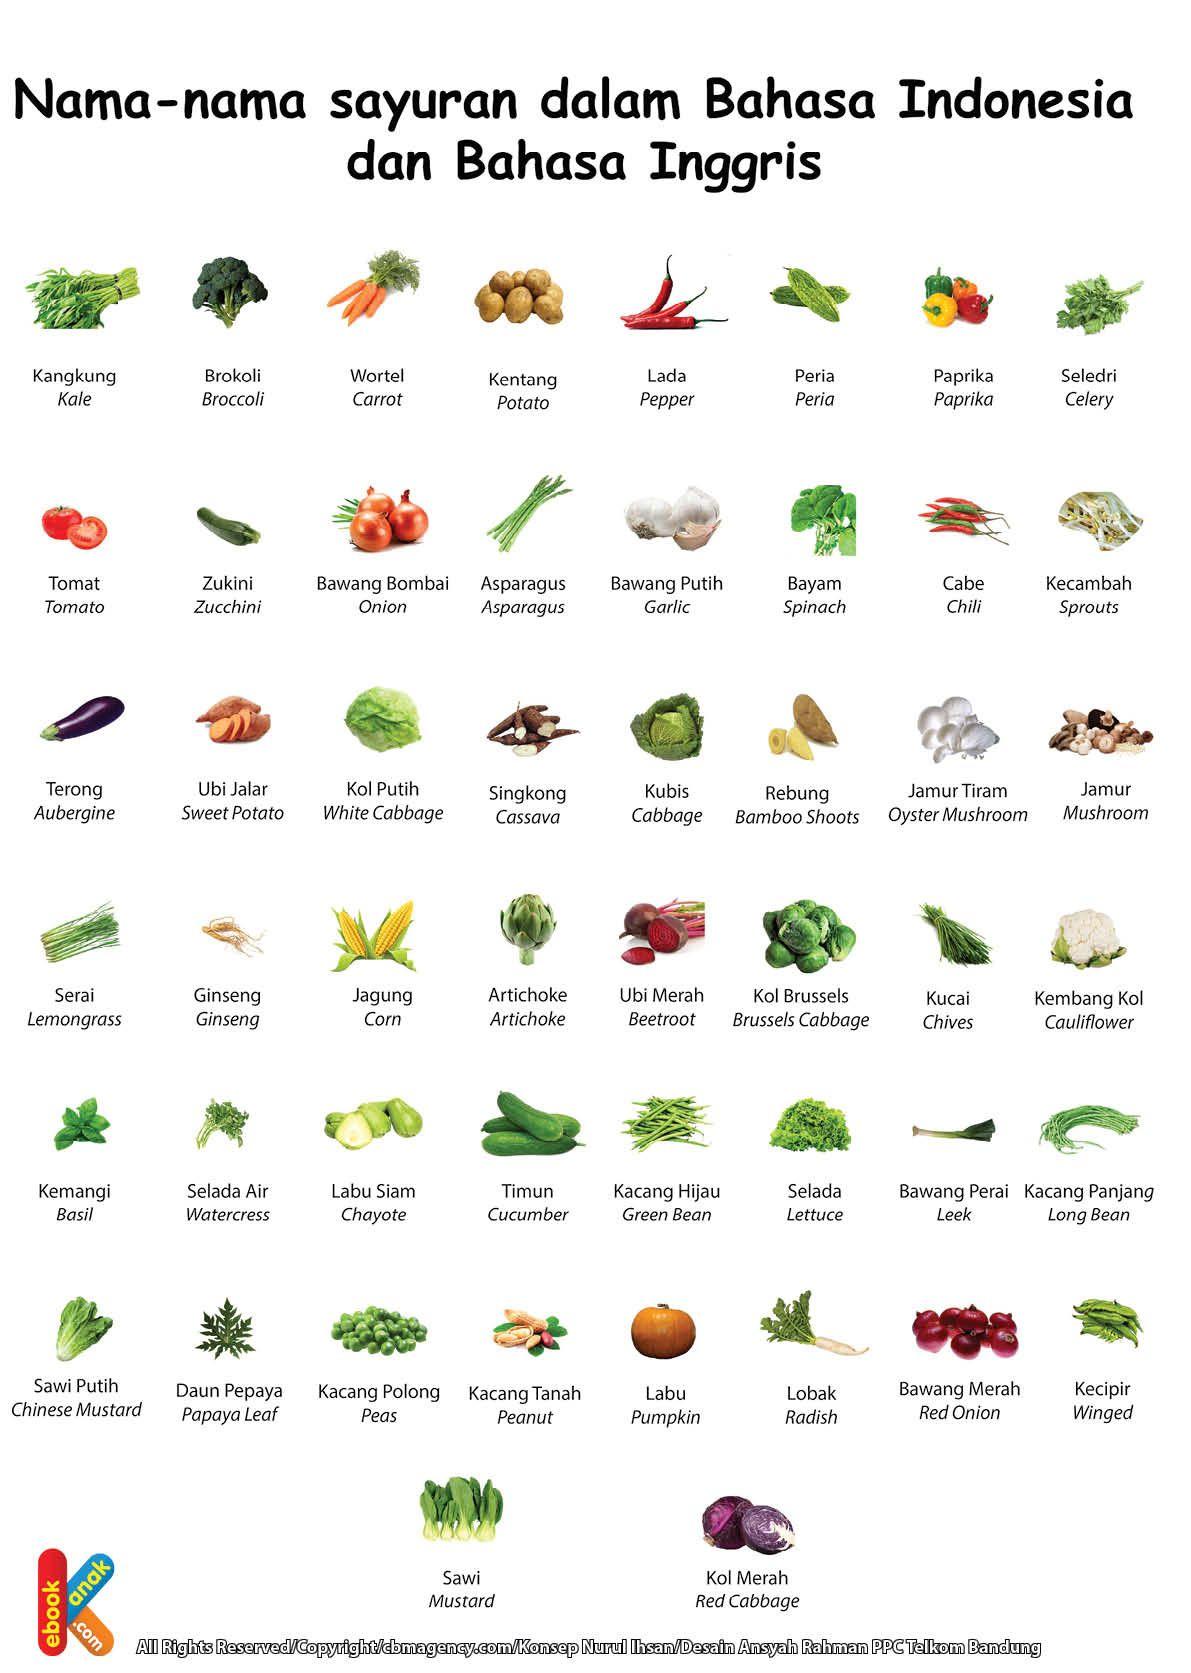 Nama Nama Sayuran Dalam Bahasa Inggris : sayuran, dalam, bahasa, inggris, Mengenal, Sayur, Sayuran, Dalam, Bahasa, Indonesia, Cute766